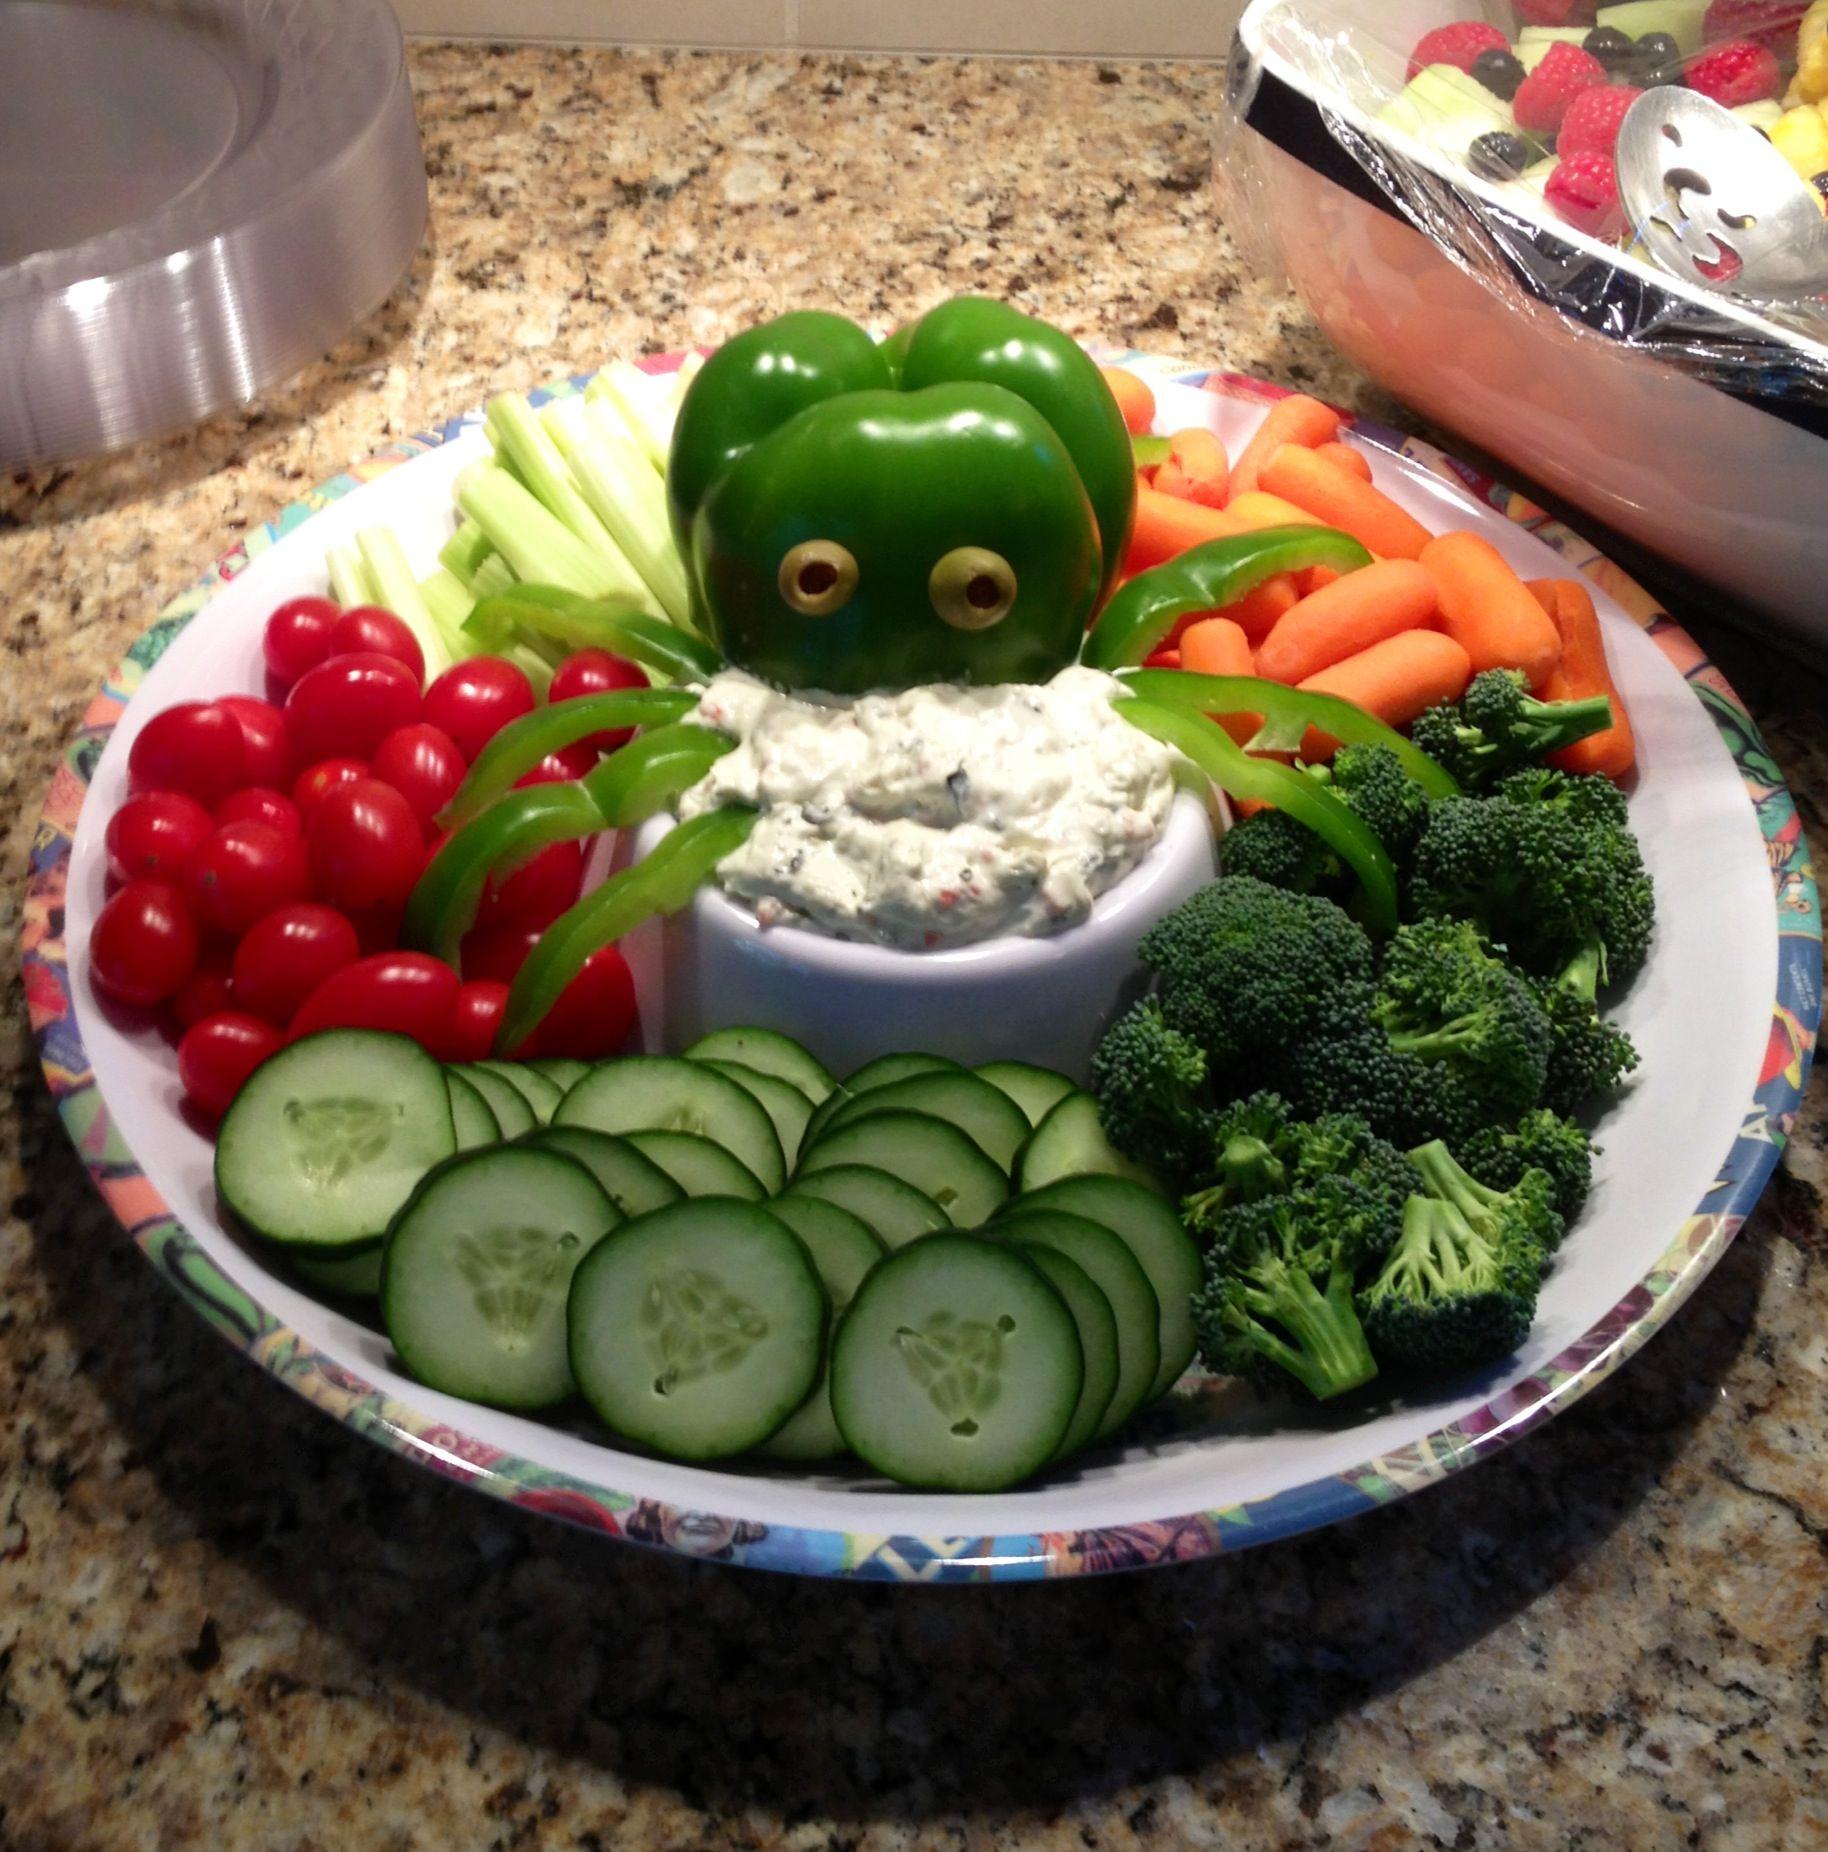 Octopus veggies for nautical theme baby shower.